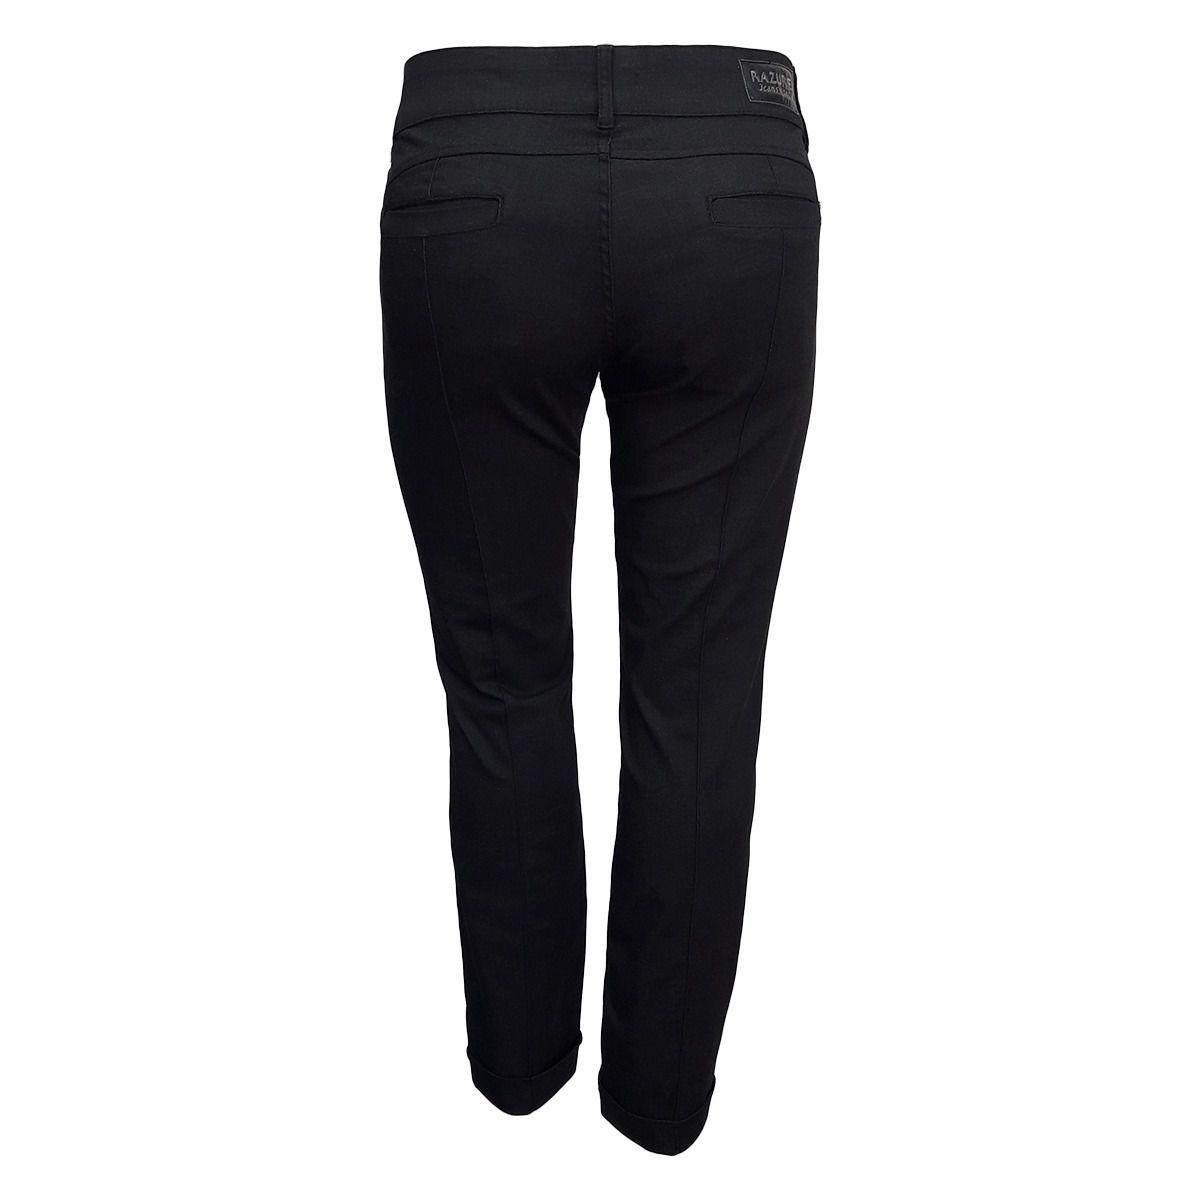 Calça Jeans Feminina Social Plus Size